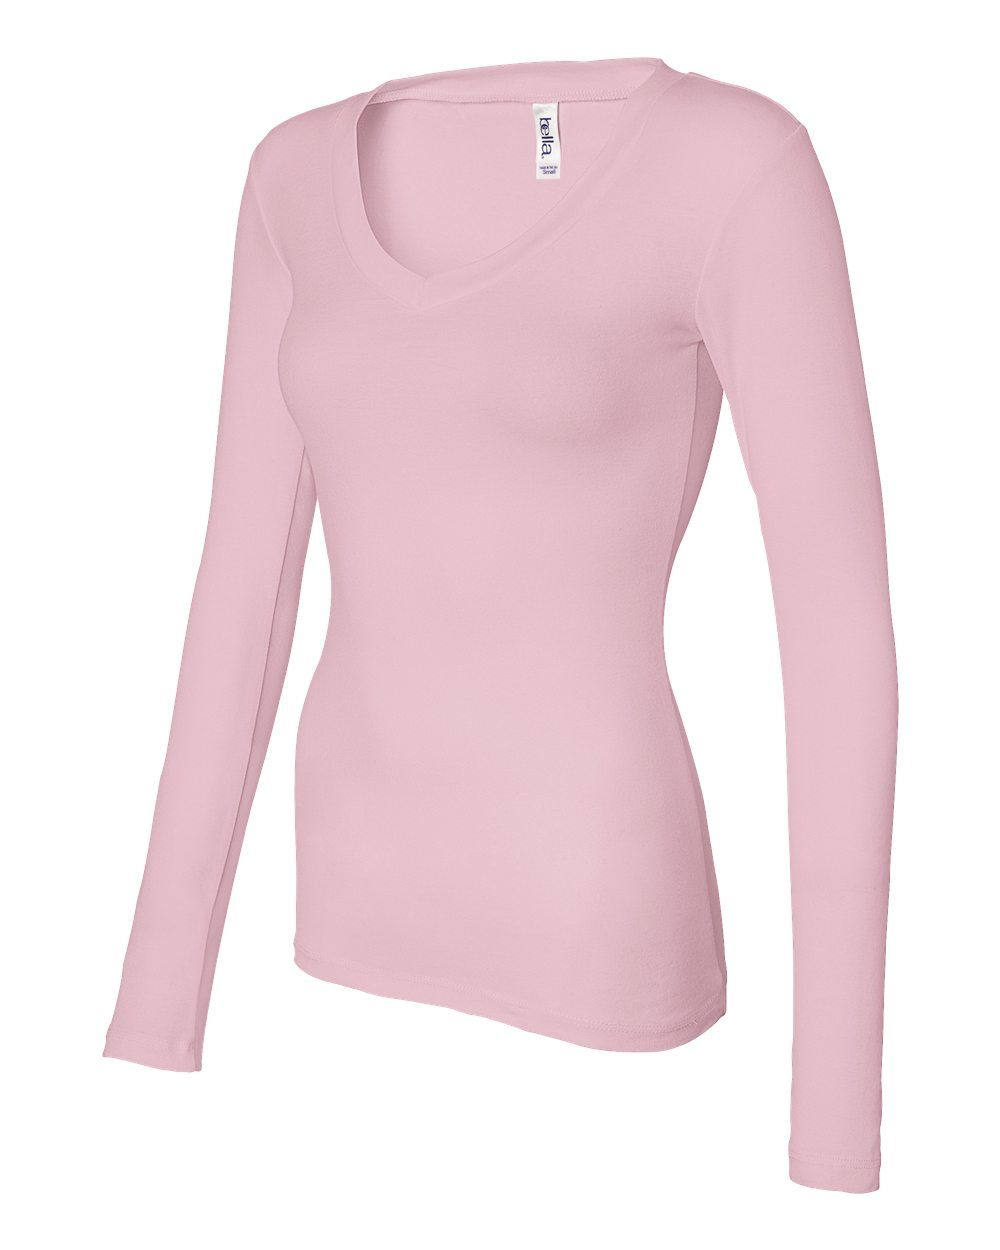 Bella 8750 Pink